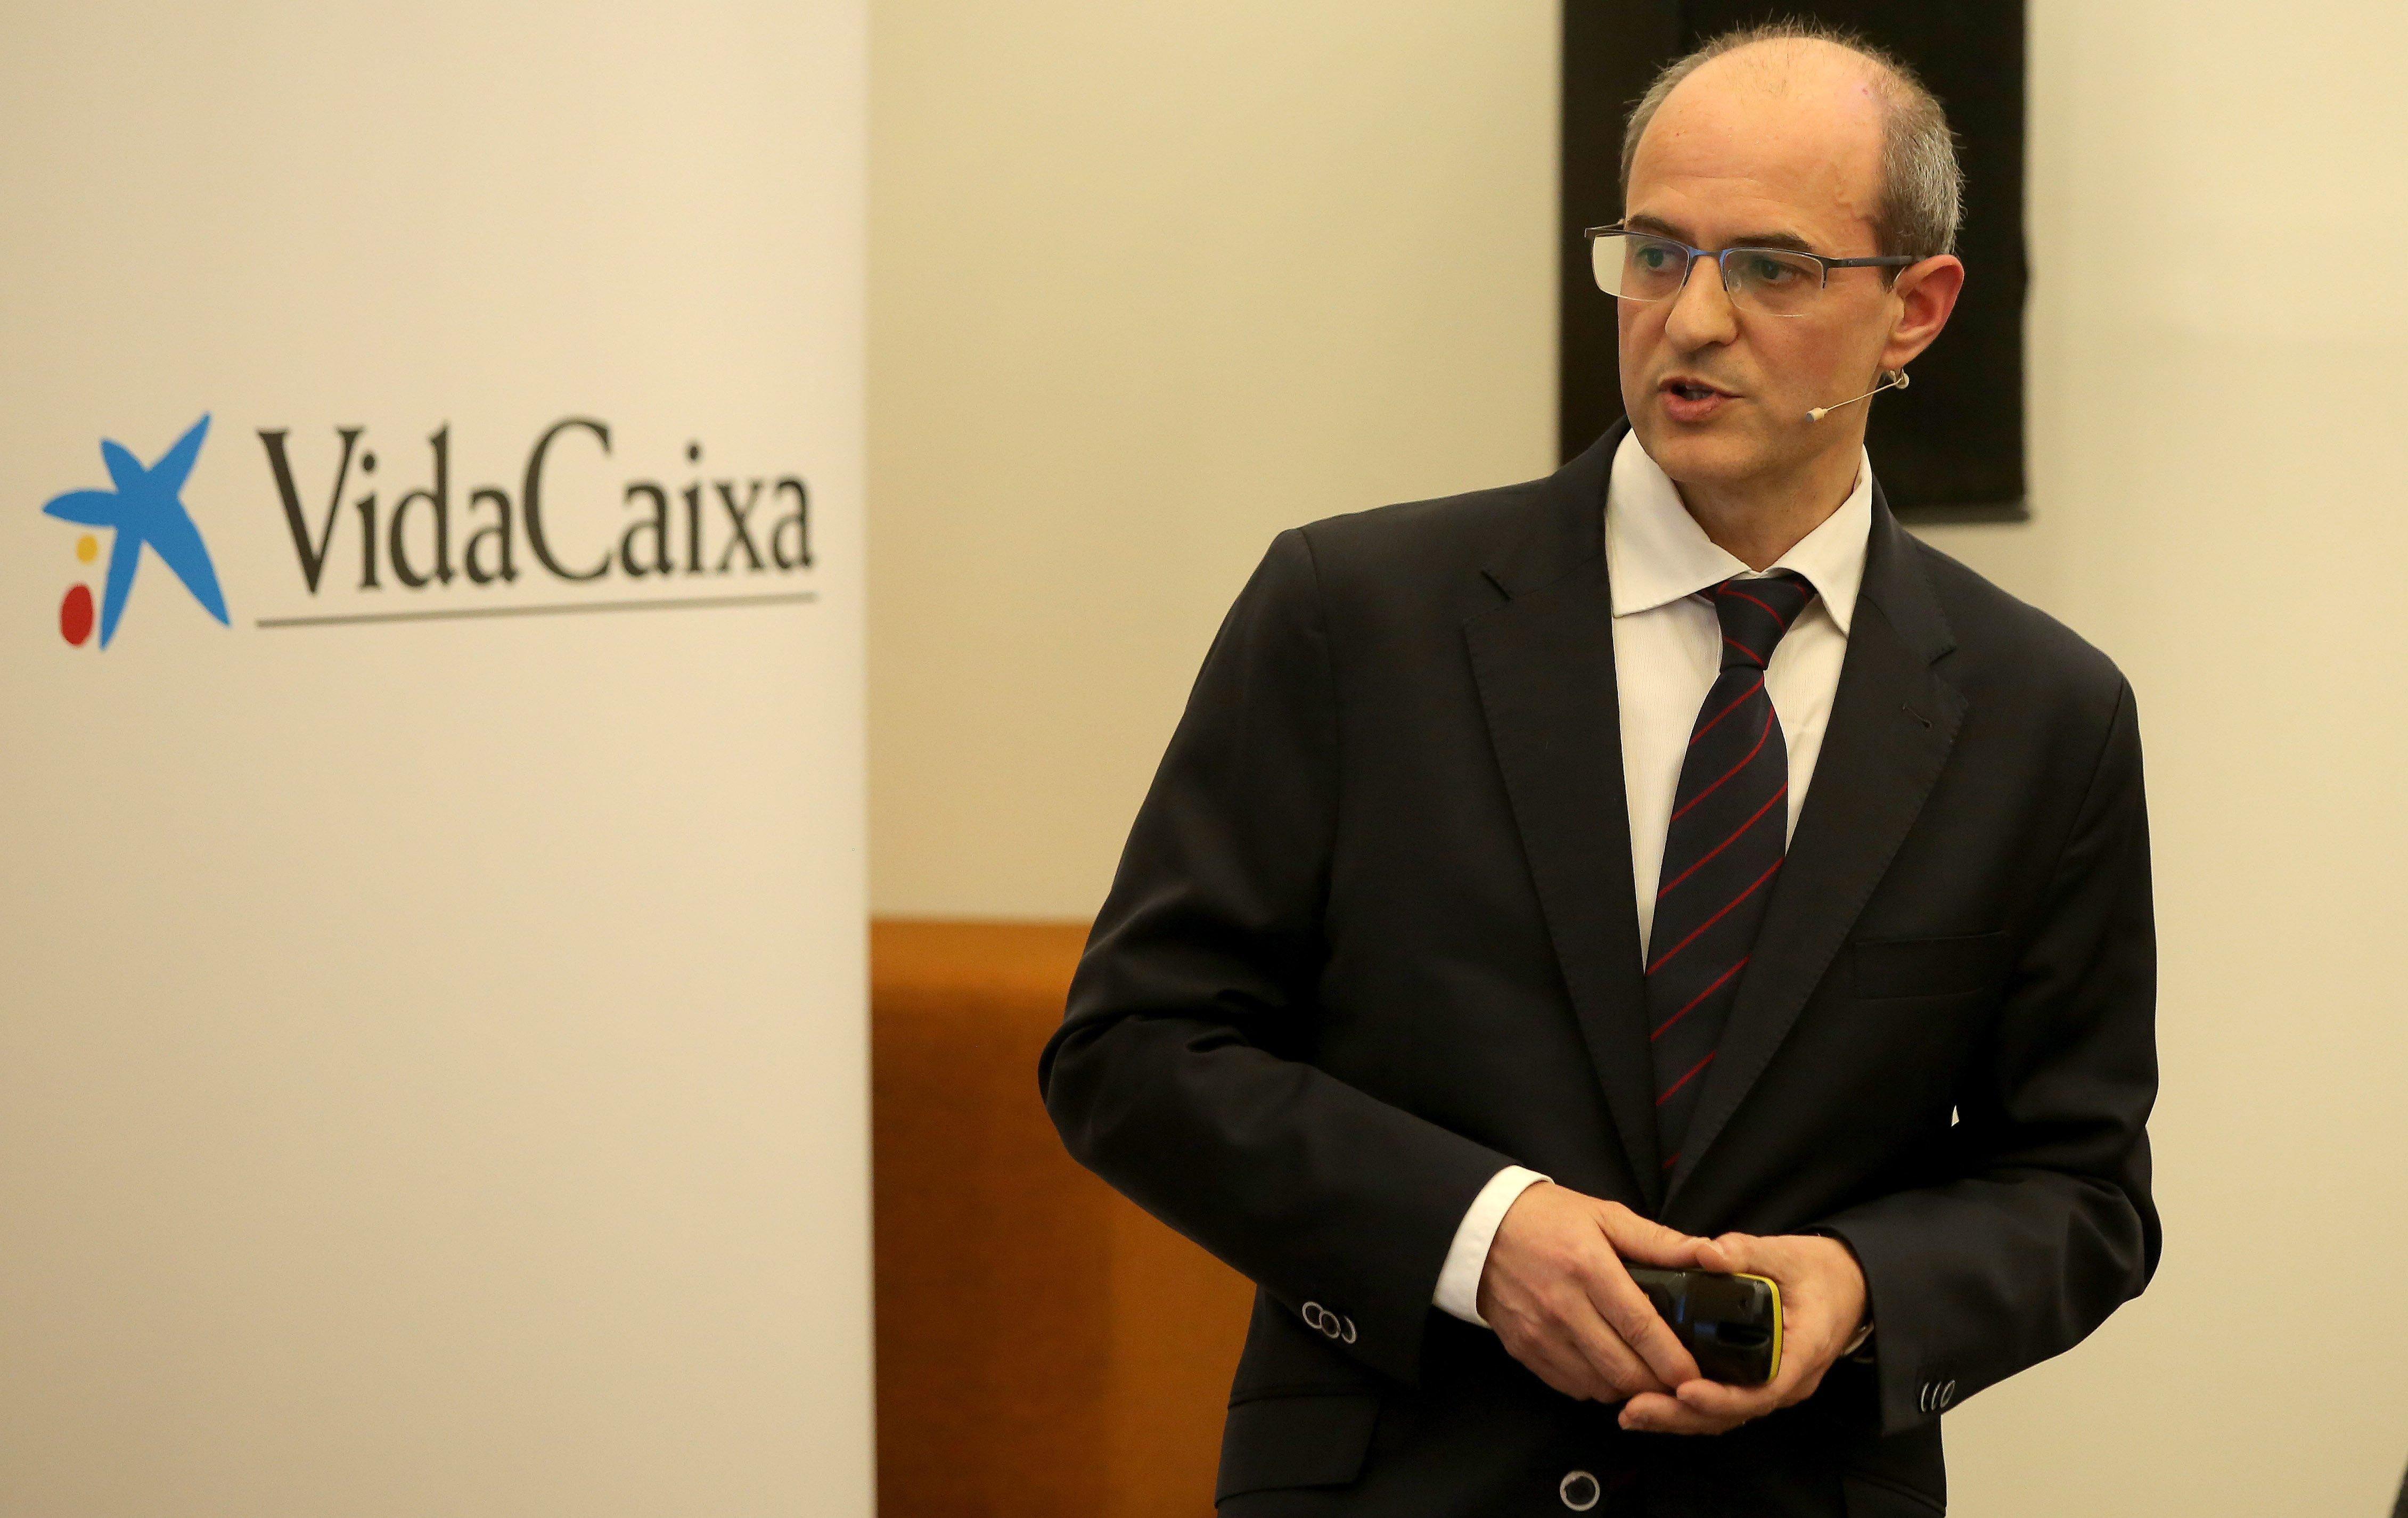 Javier Valle, CEO de VidaCaixa